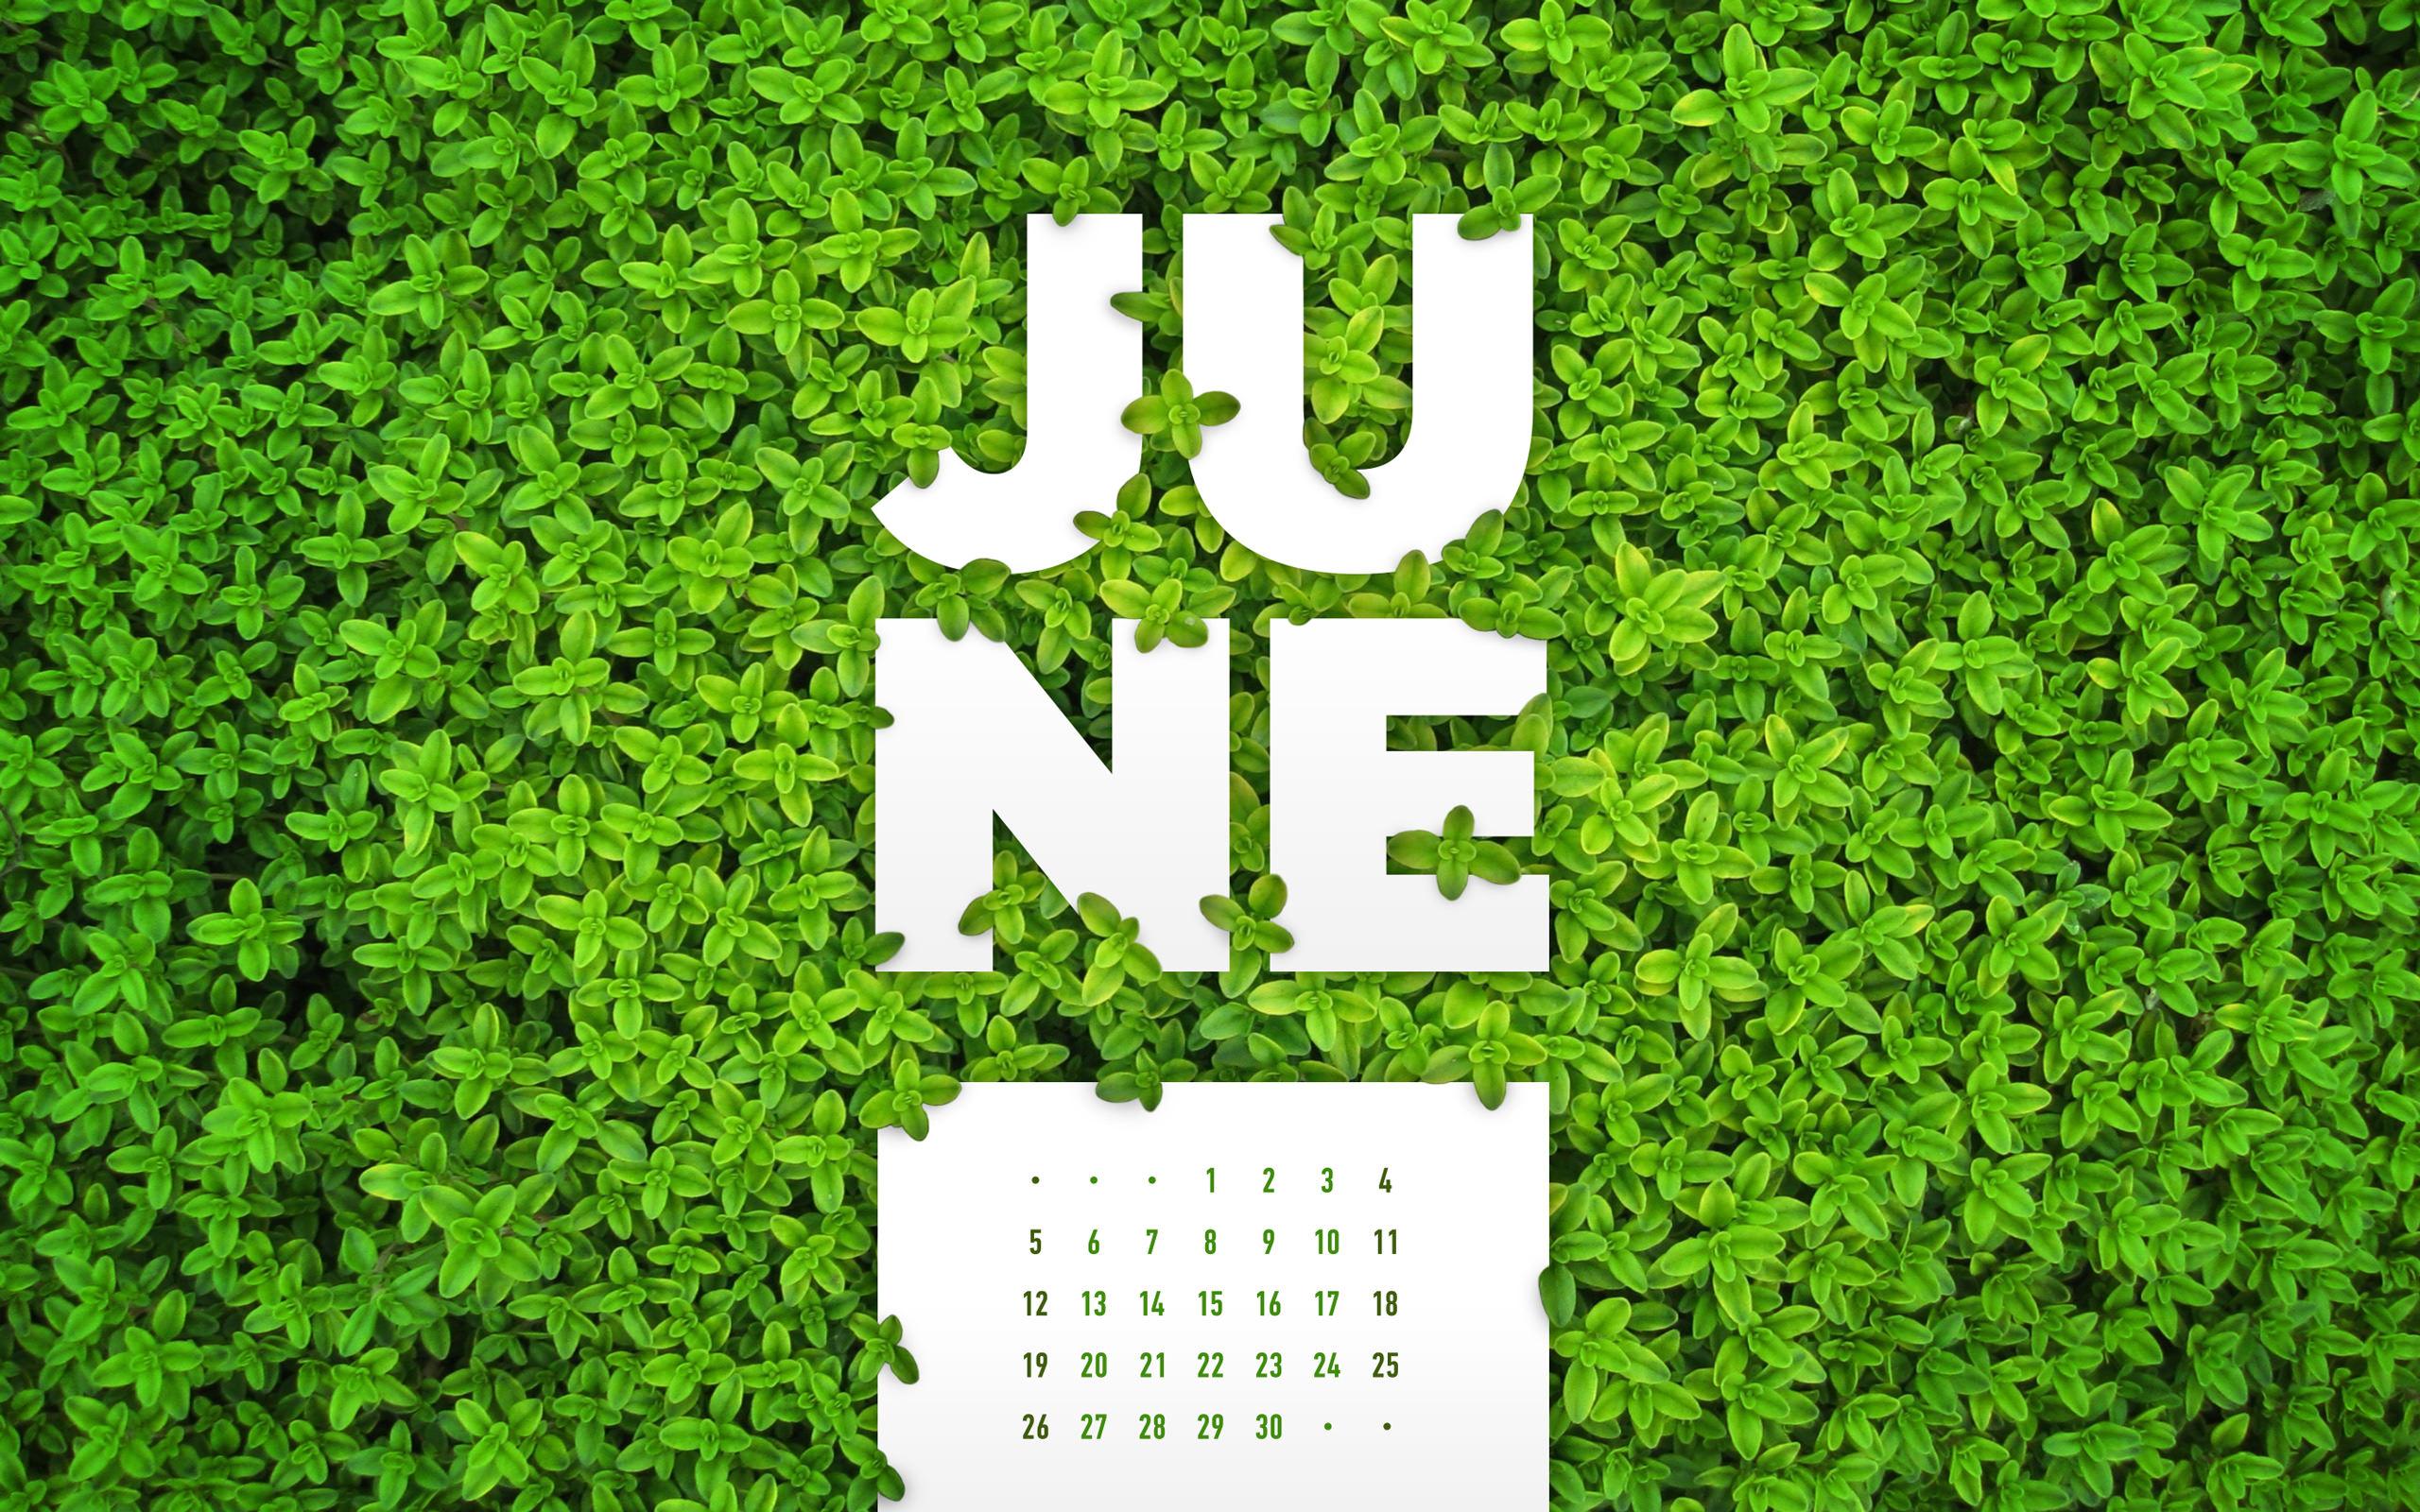 June 2016 Desktop Calendar Wallpaper Paper Leaf 2560x1600